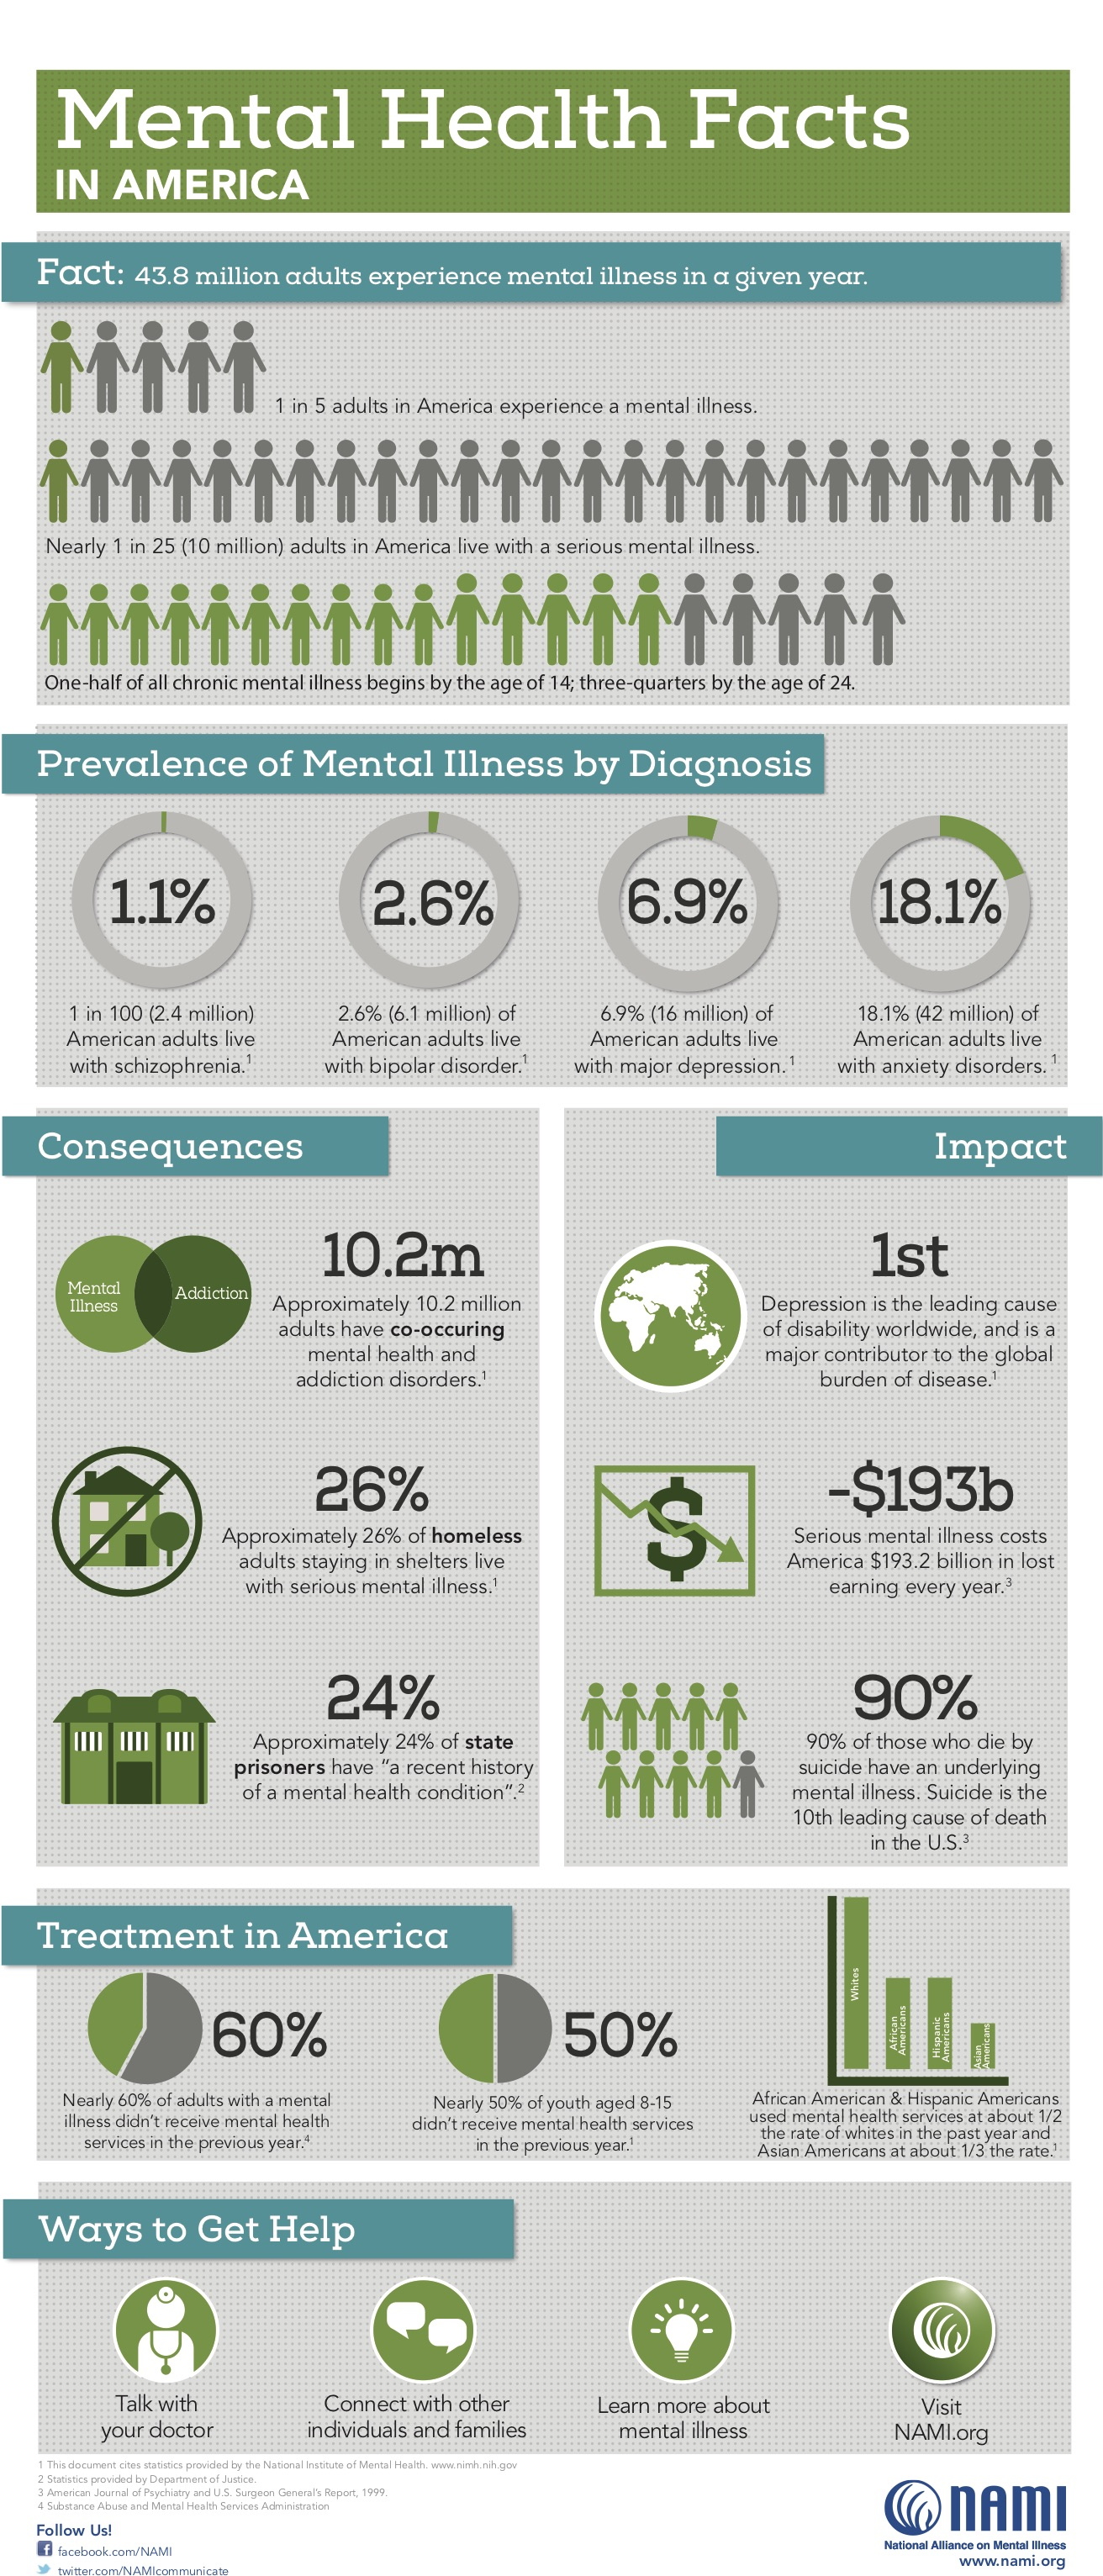 MH_Infographic.jpg